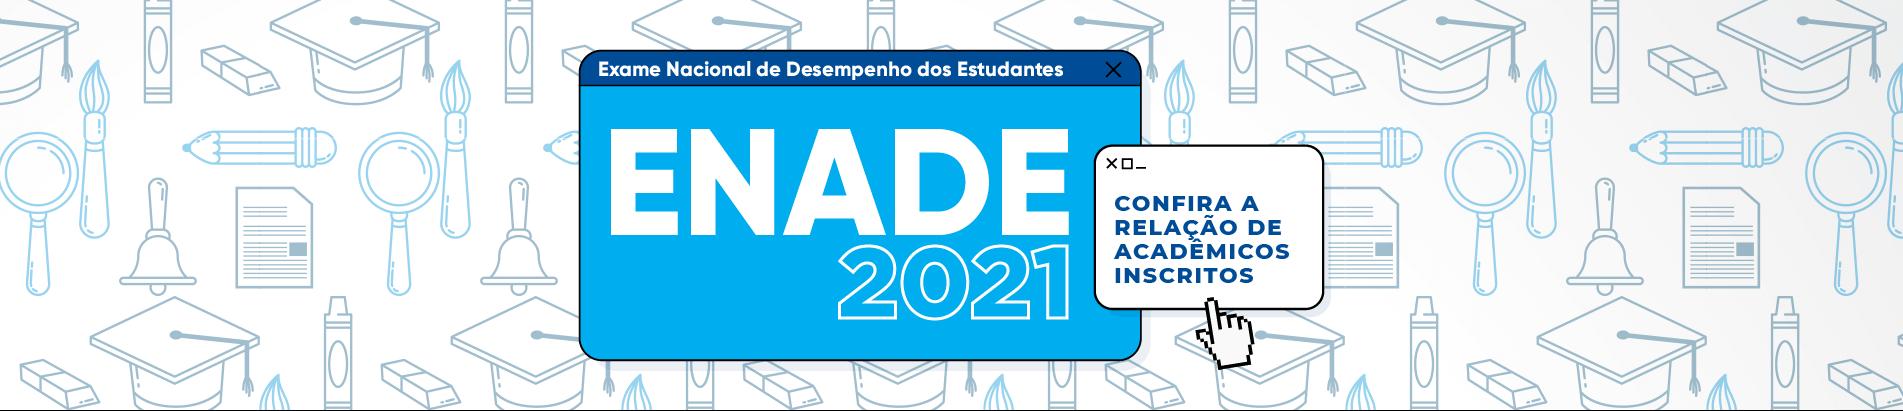 Banner ENADE 2021 DESKTOP